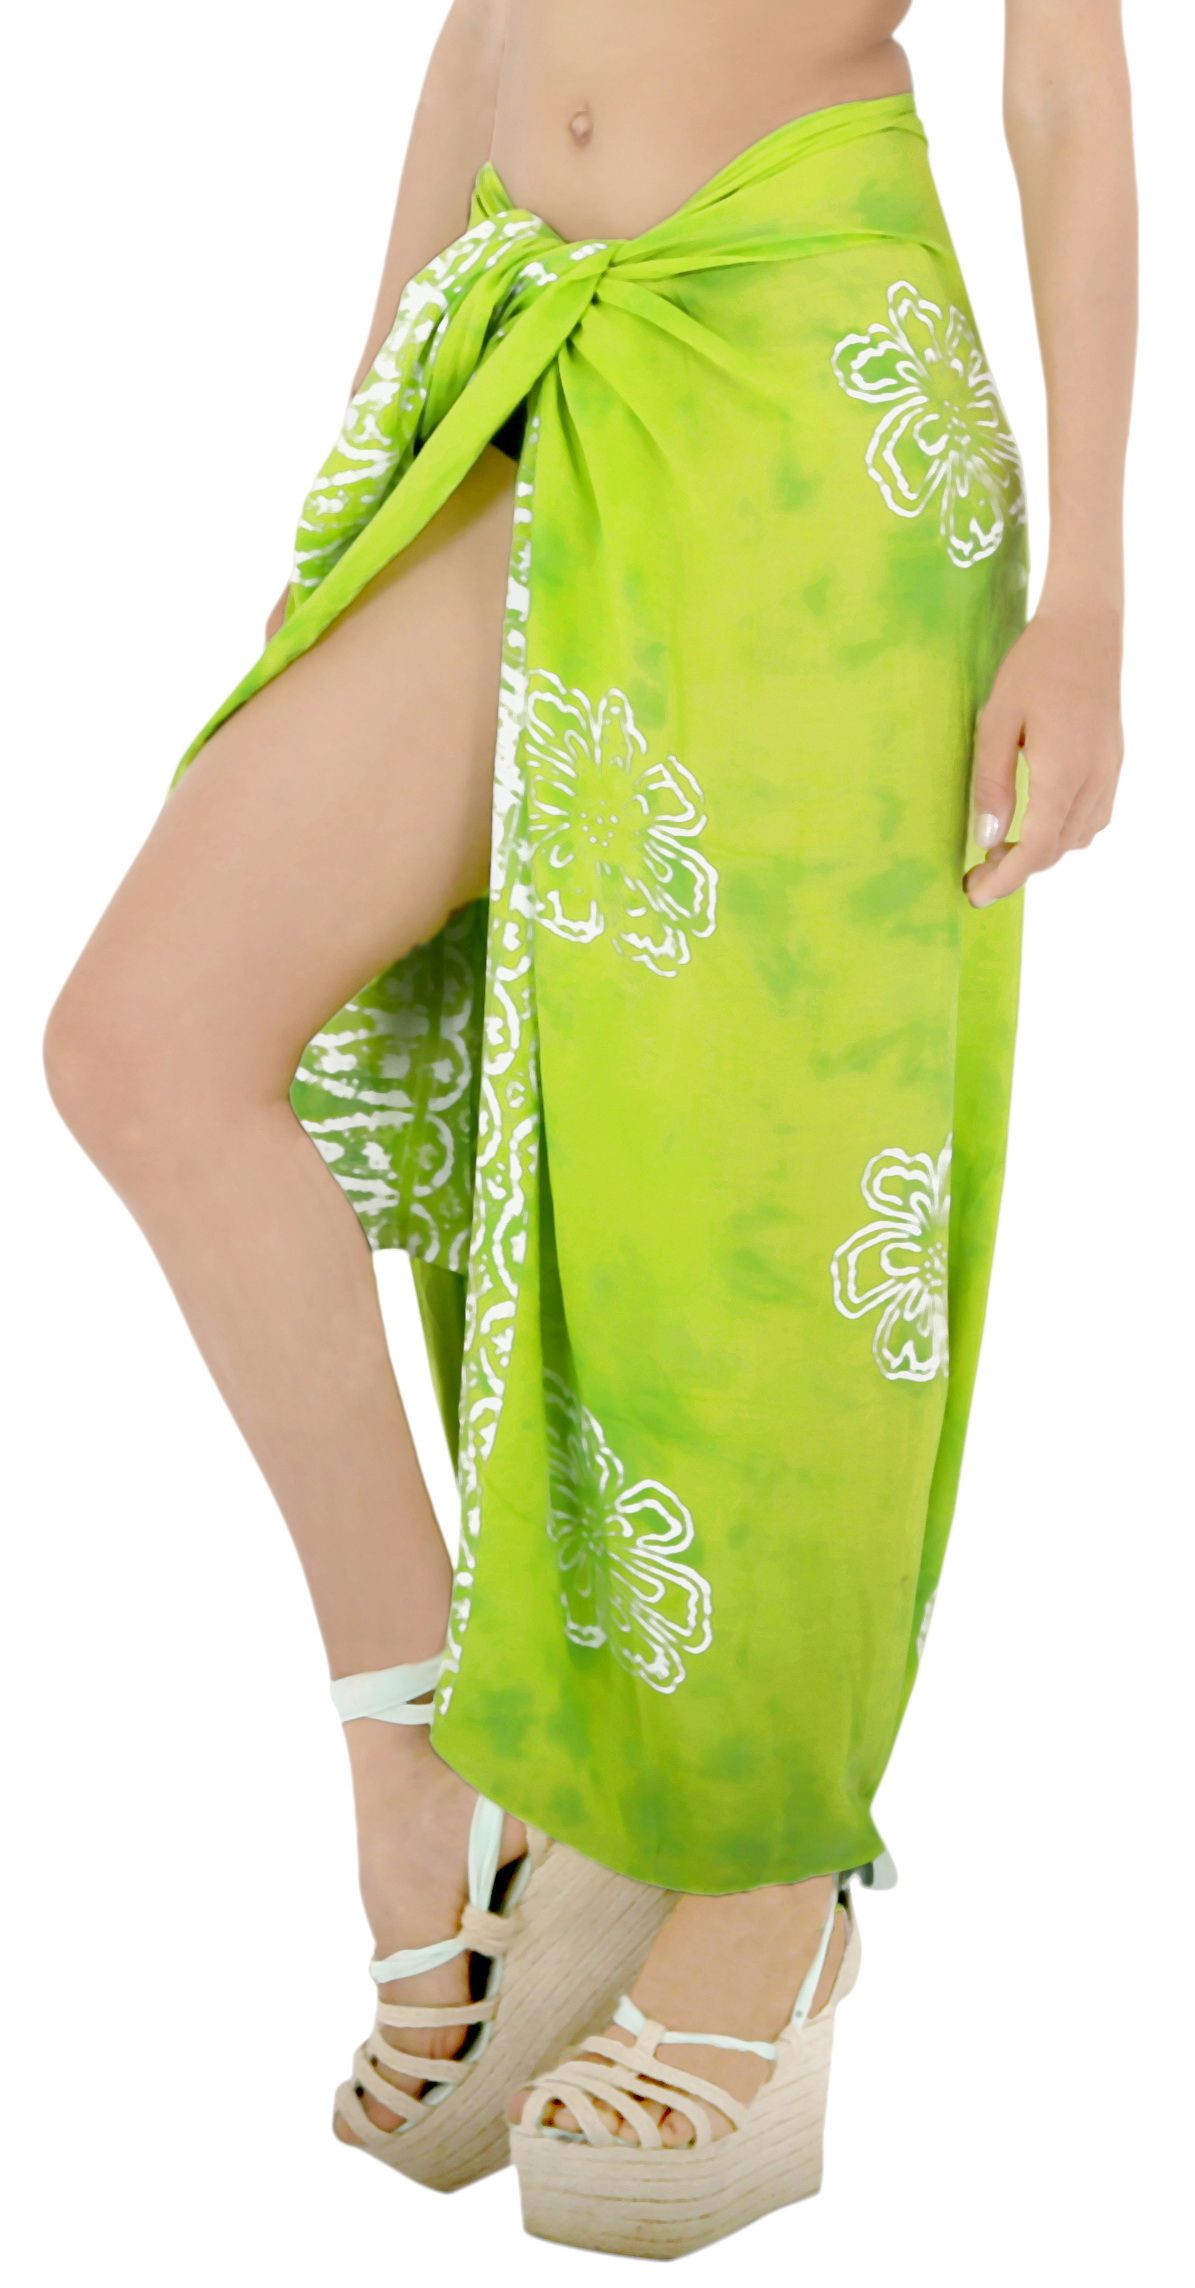 3f75e8ce03 LA LEELA Rayon Womens Sarong Pareo Suit Beach Towel Swimwear Tie Wrap Skirt# Womens, #Sarong, #Pareo